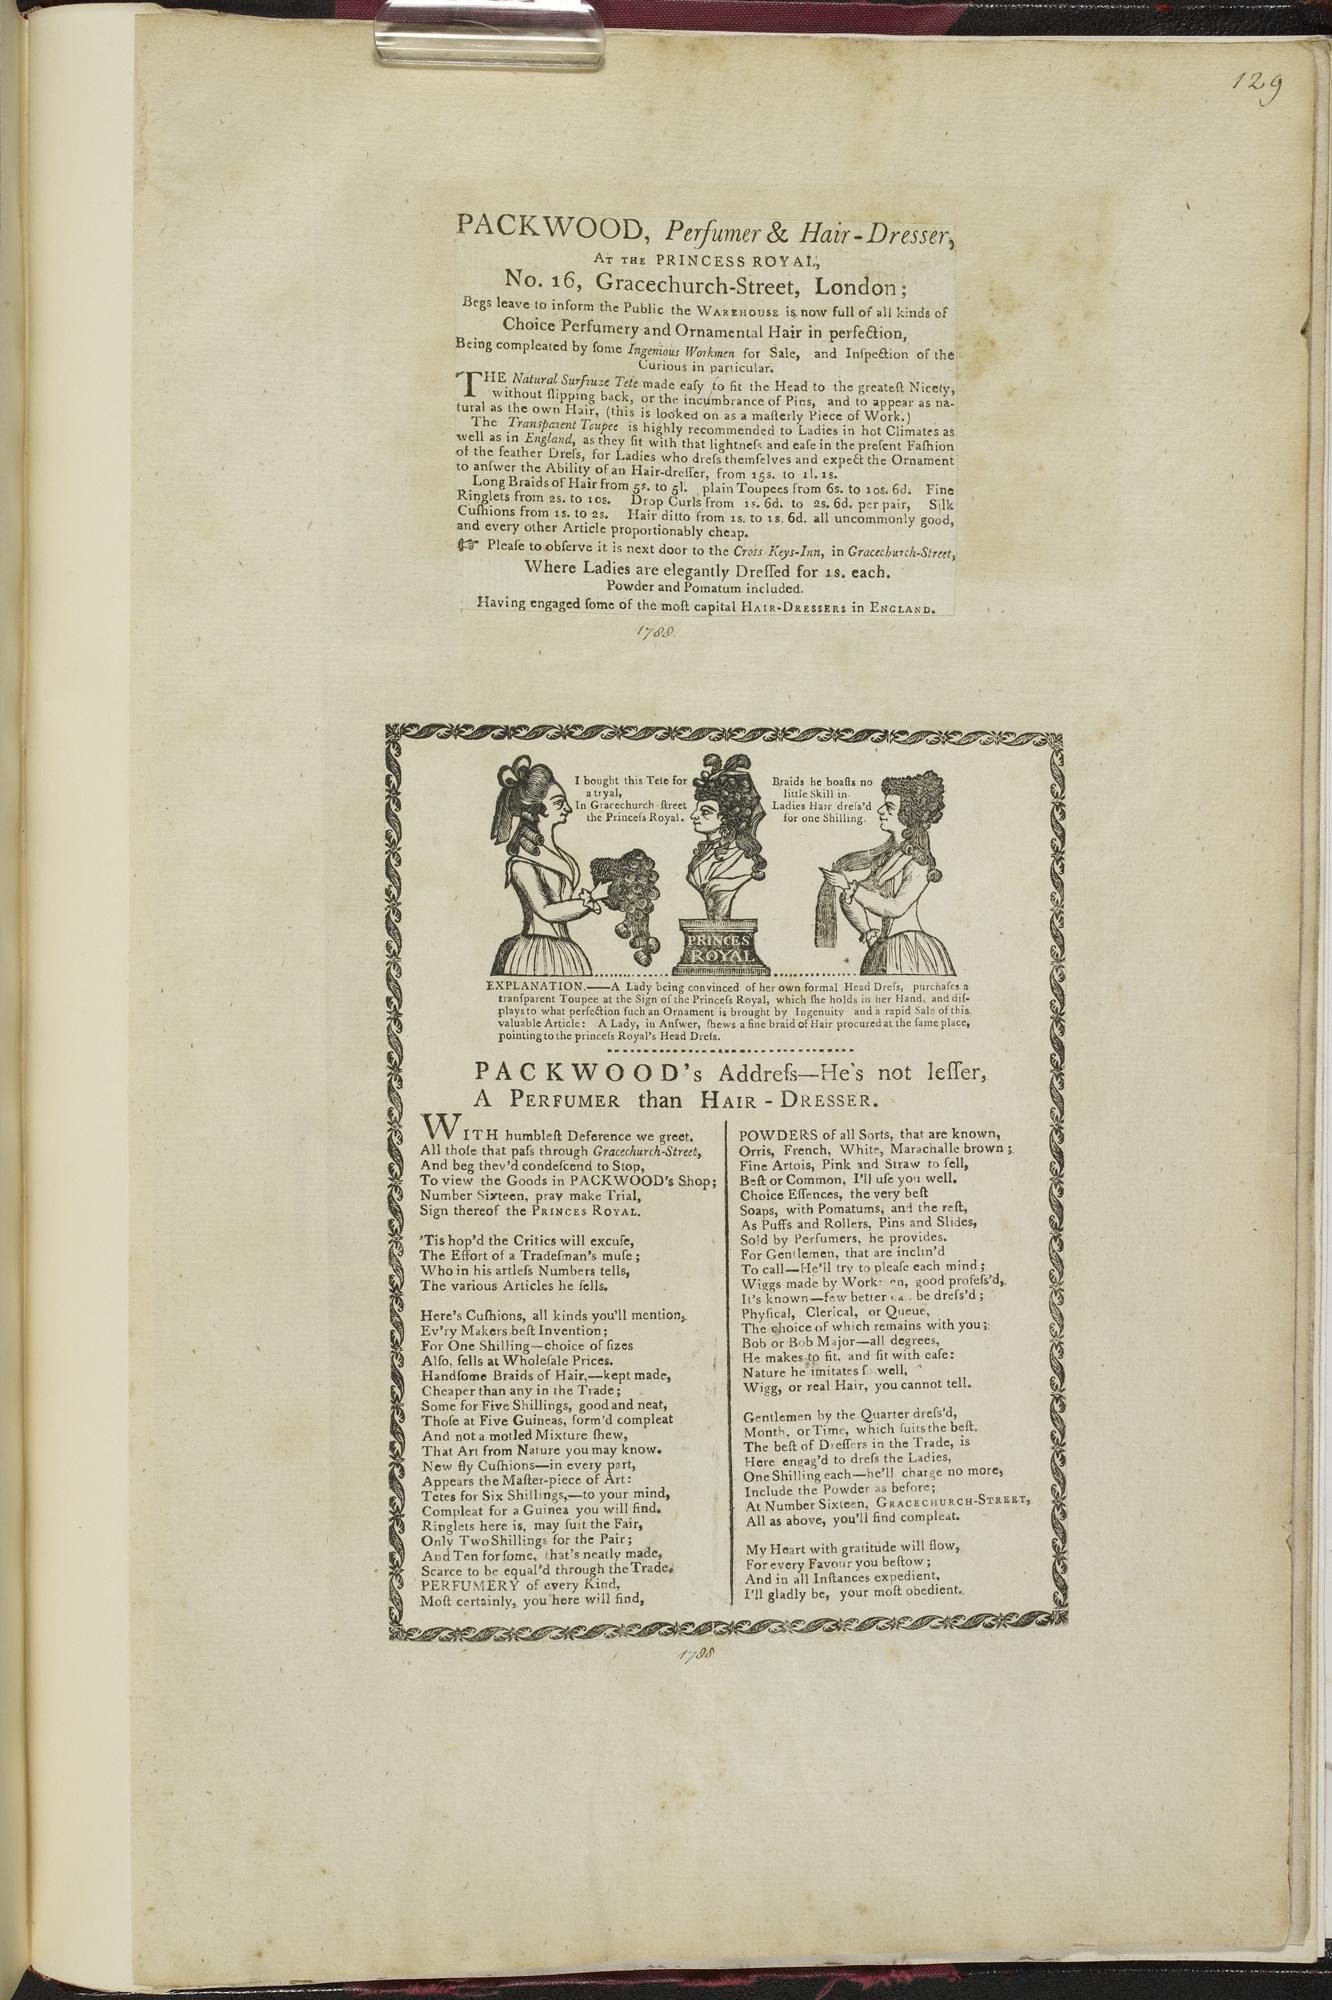 Advertisement for Packwood's, 'Perfumer and Hair-Dresser', 1788